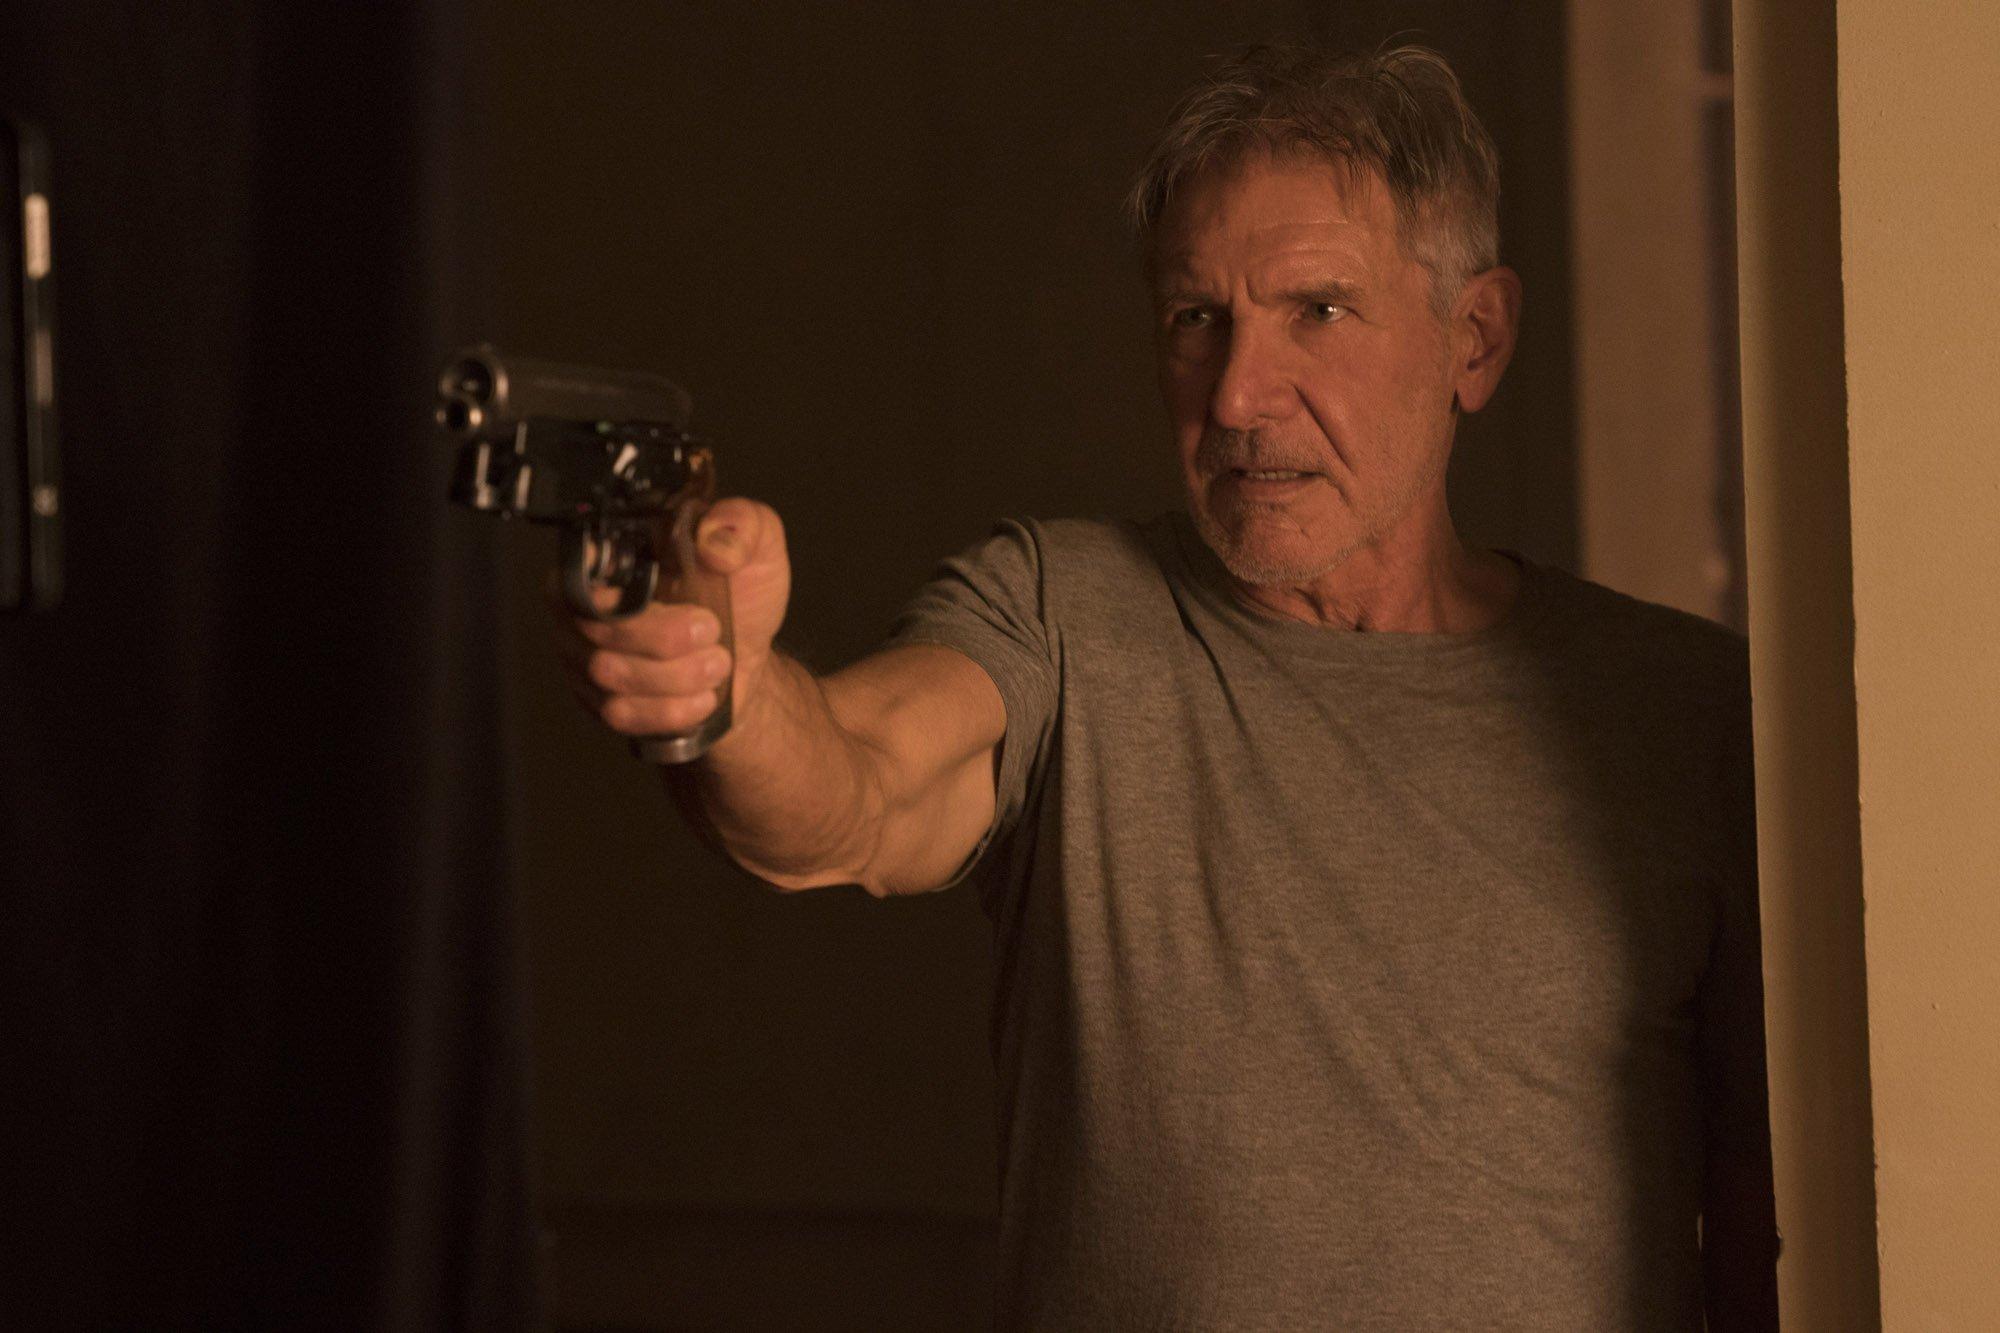 Photo du film Blade Runner 2049 avec Rick Deckard (Harrison Ford)